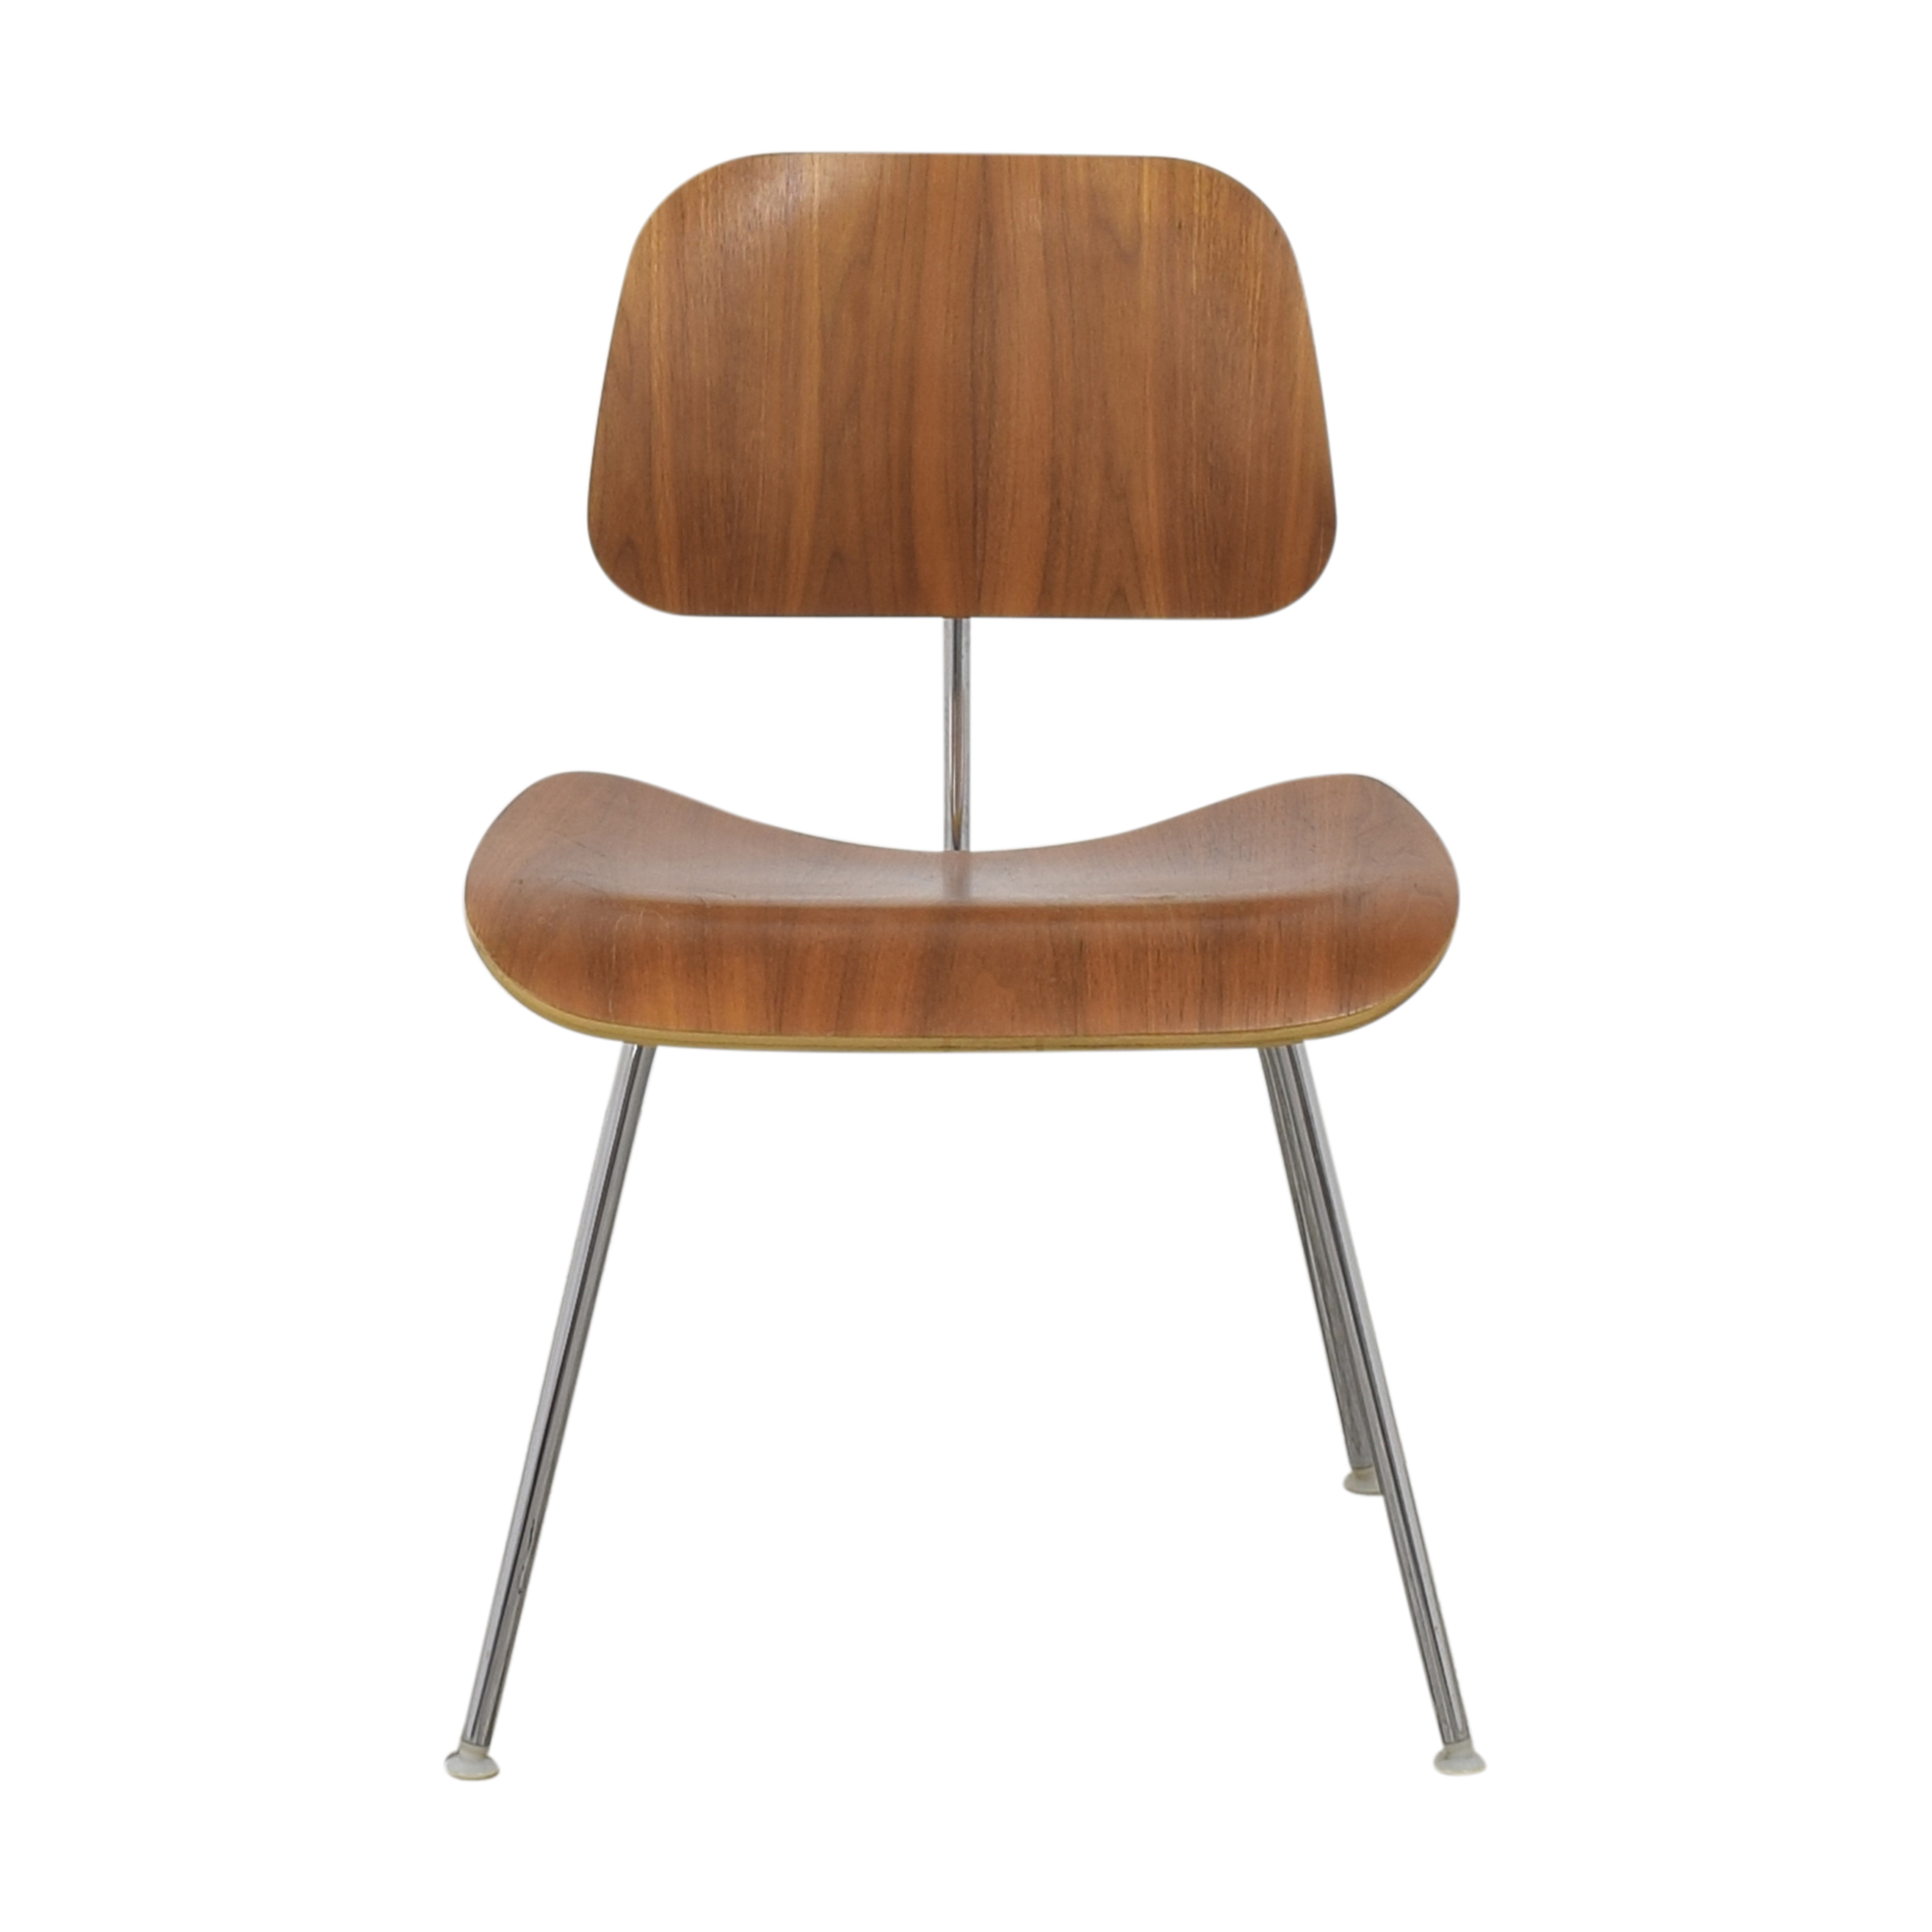 Herman Miller Herman Miller Eames Molded Dining Chair pa